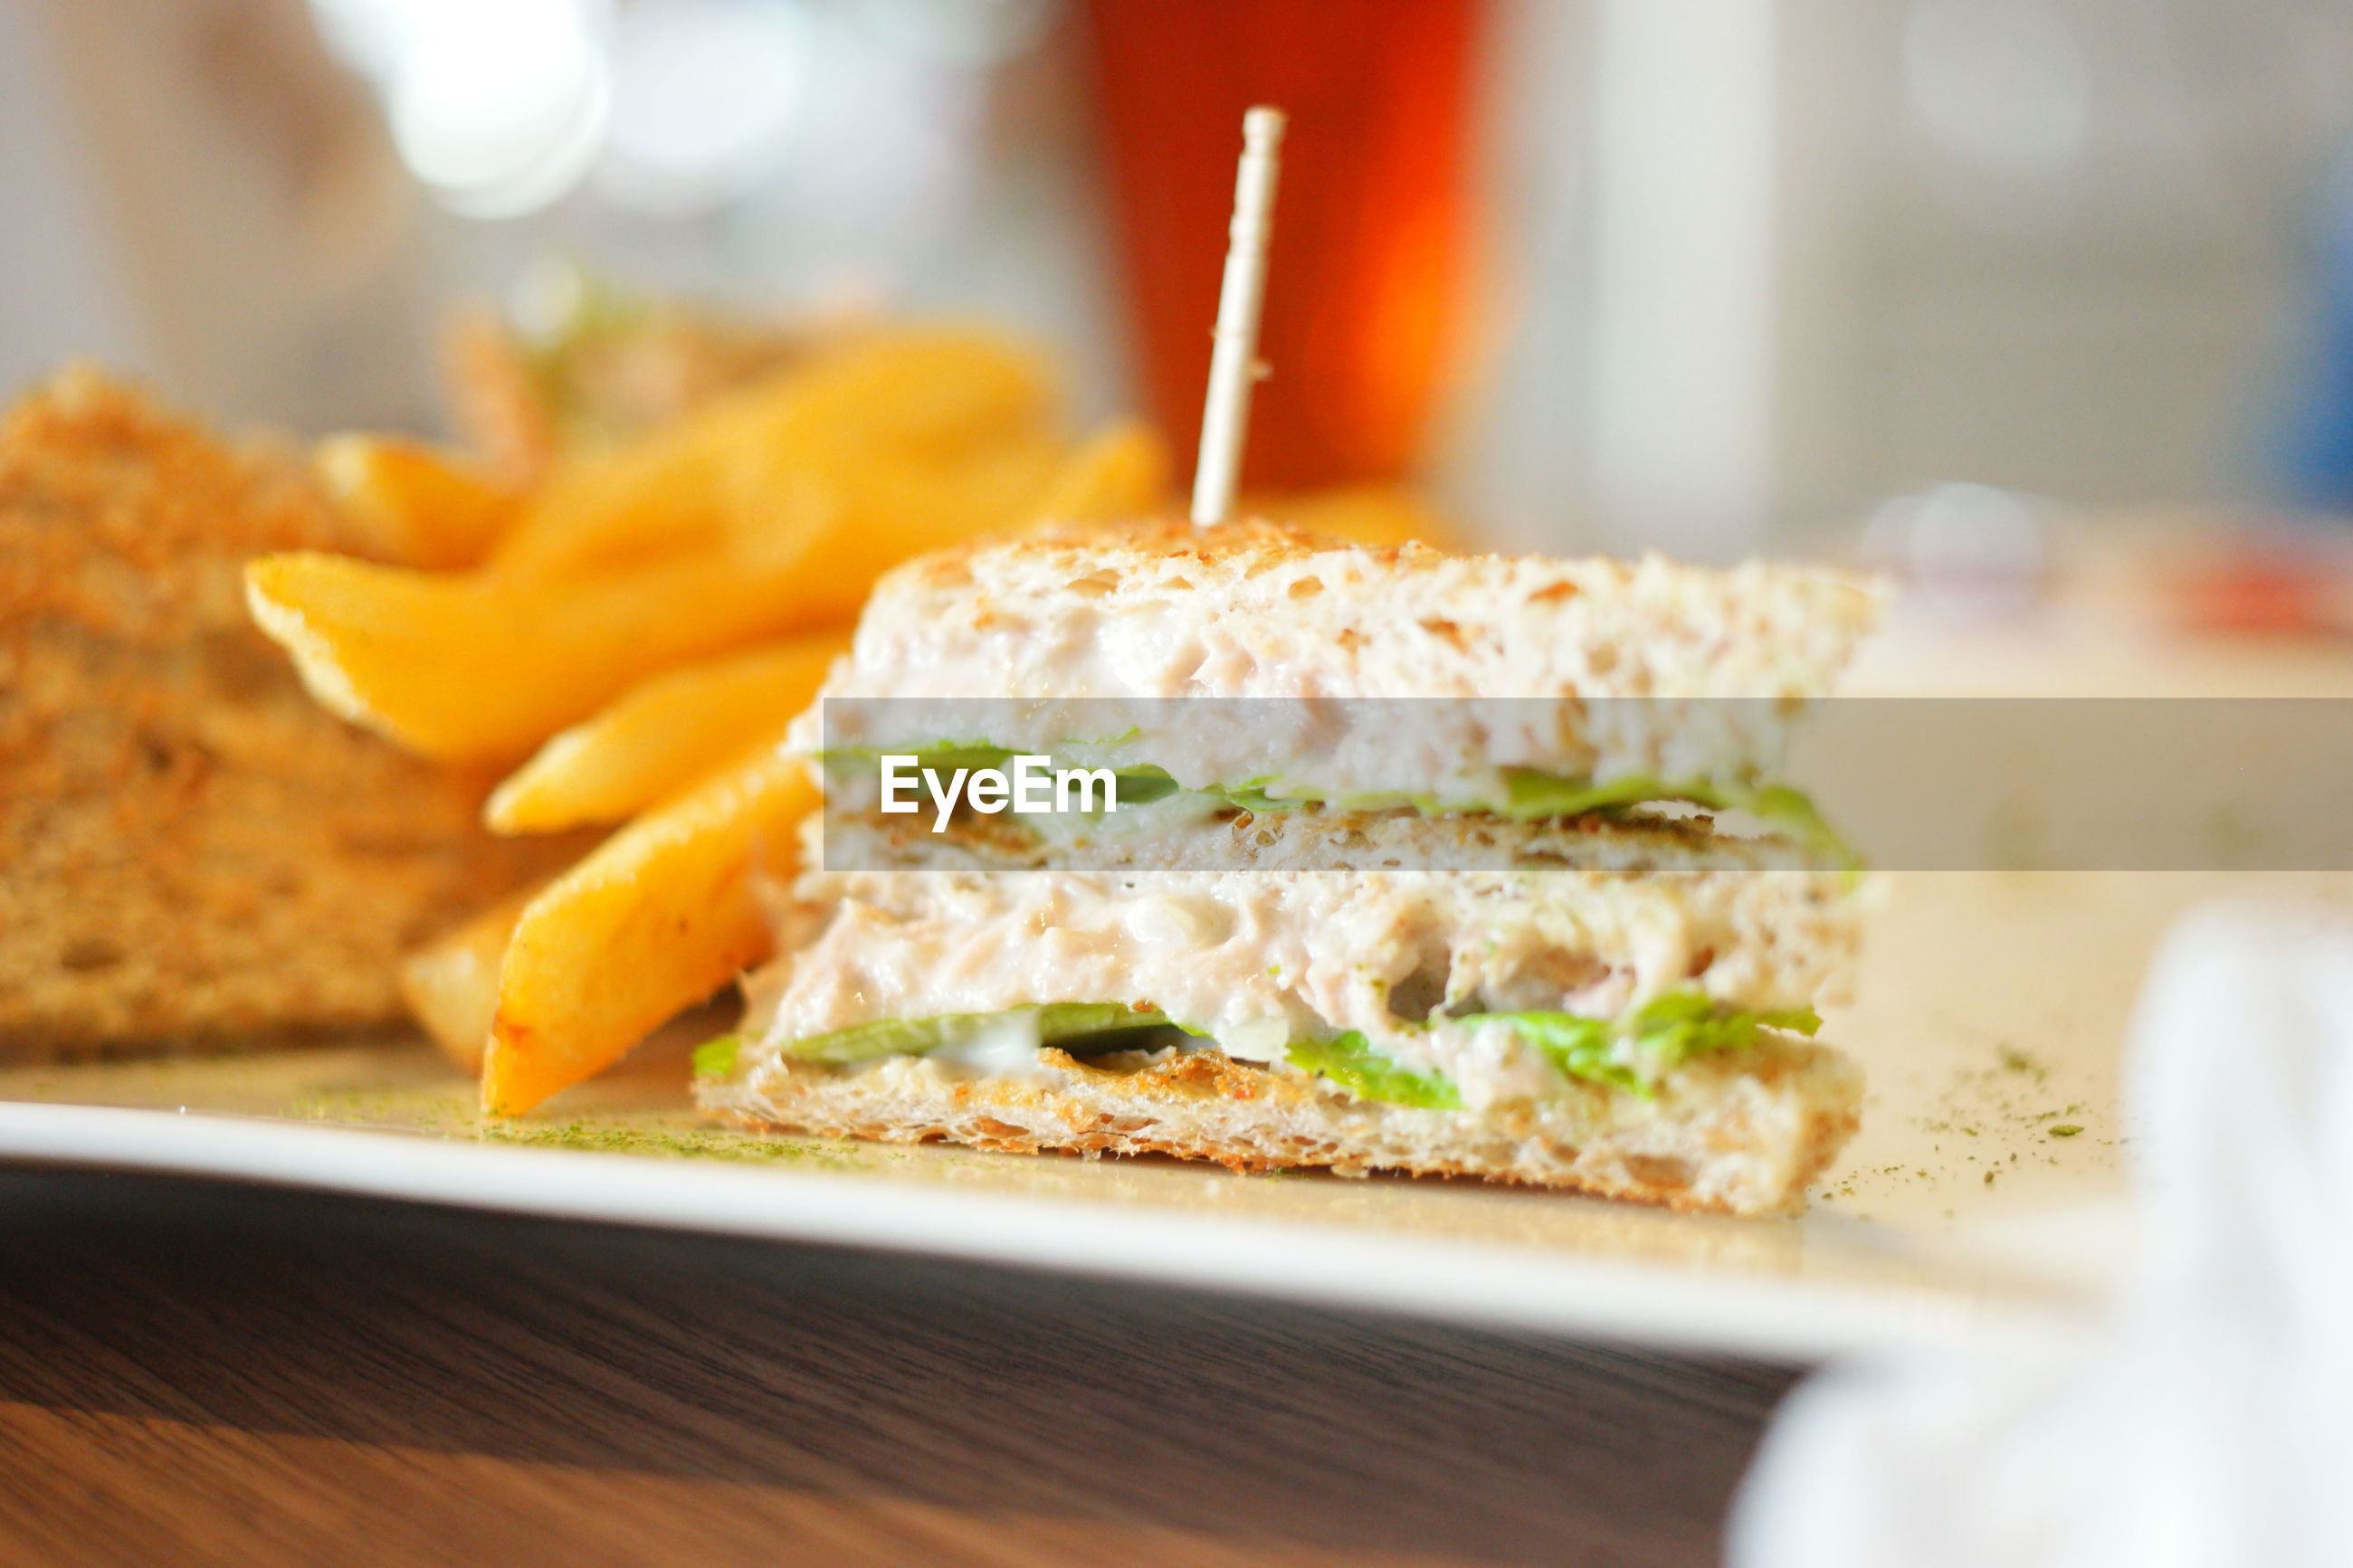 Tuna with mayonnaise and lettuce sandwich